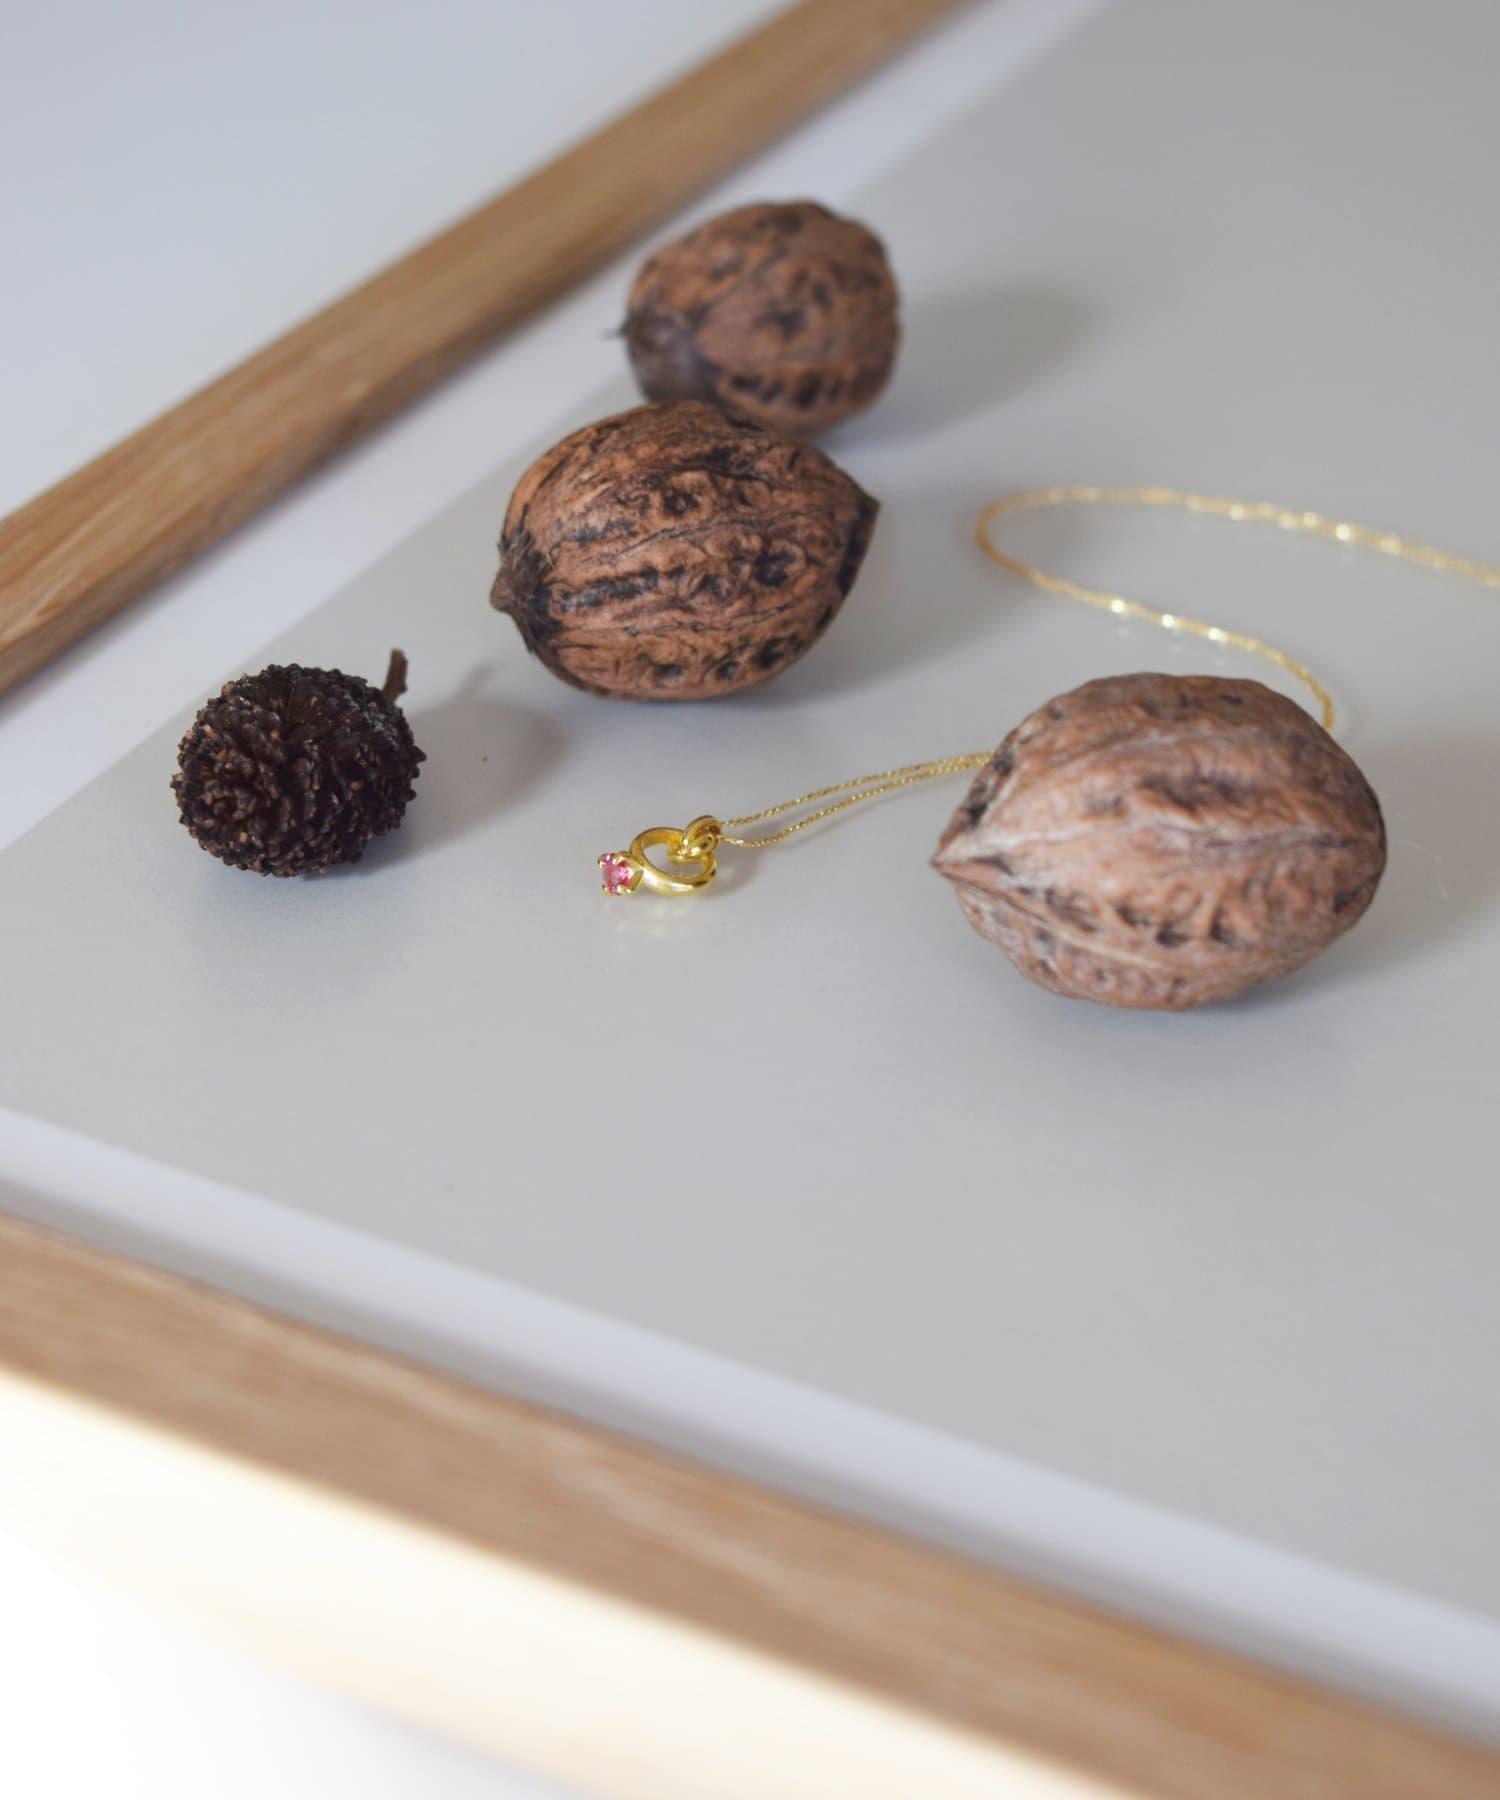 BIRTHDAY BAR(バースデイバー) レディース Birthstone Petit Ring Necklace 誕生石ネックレス サーモンピンク